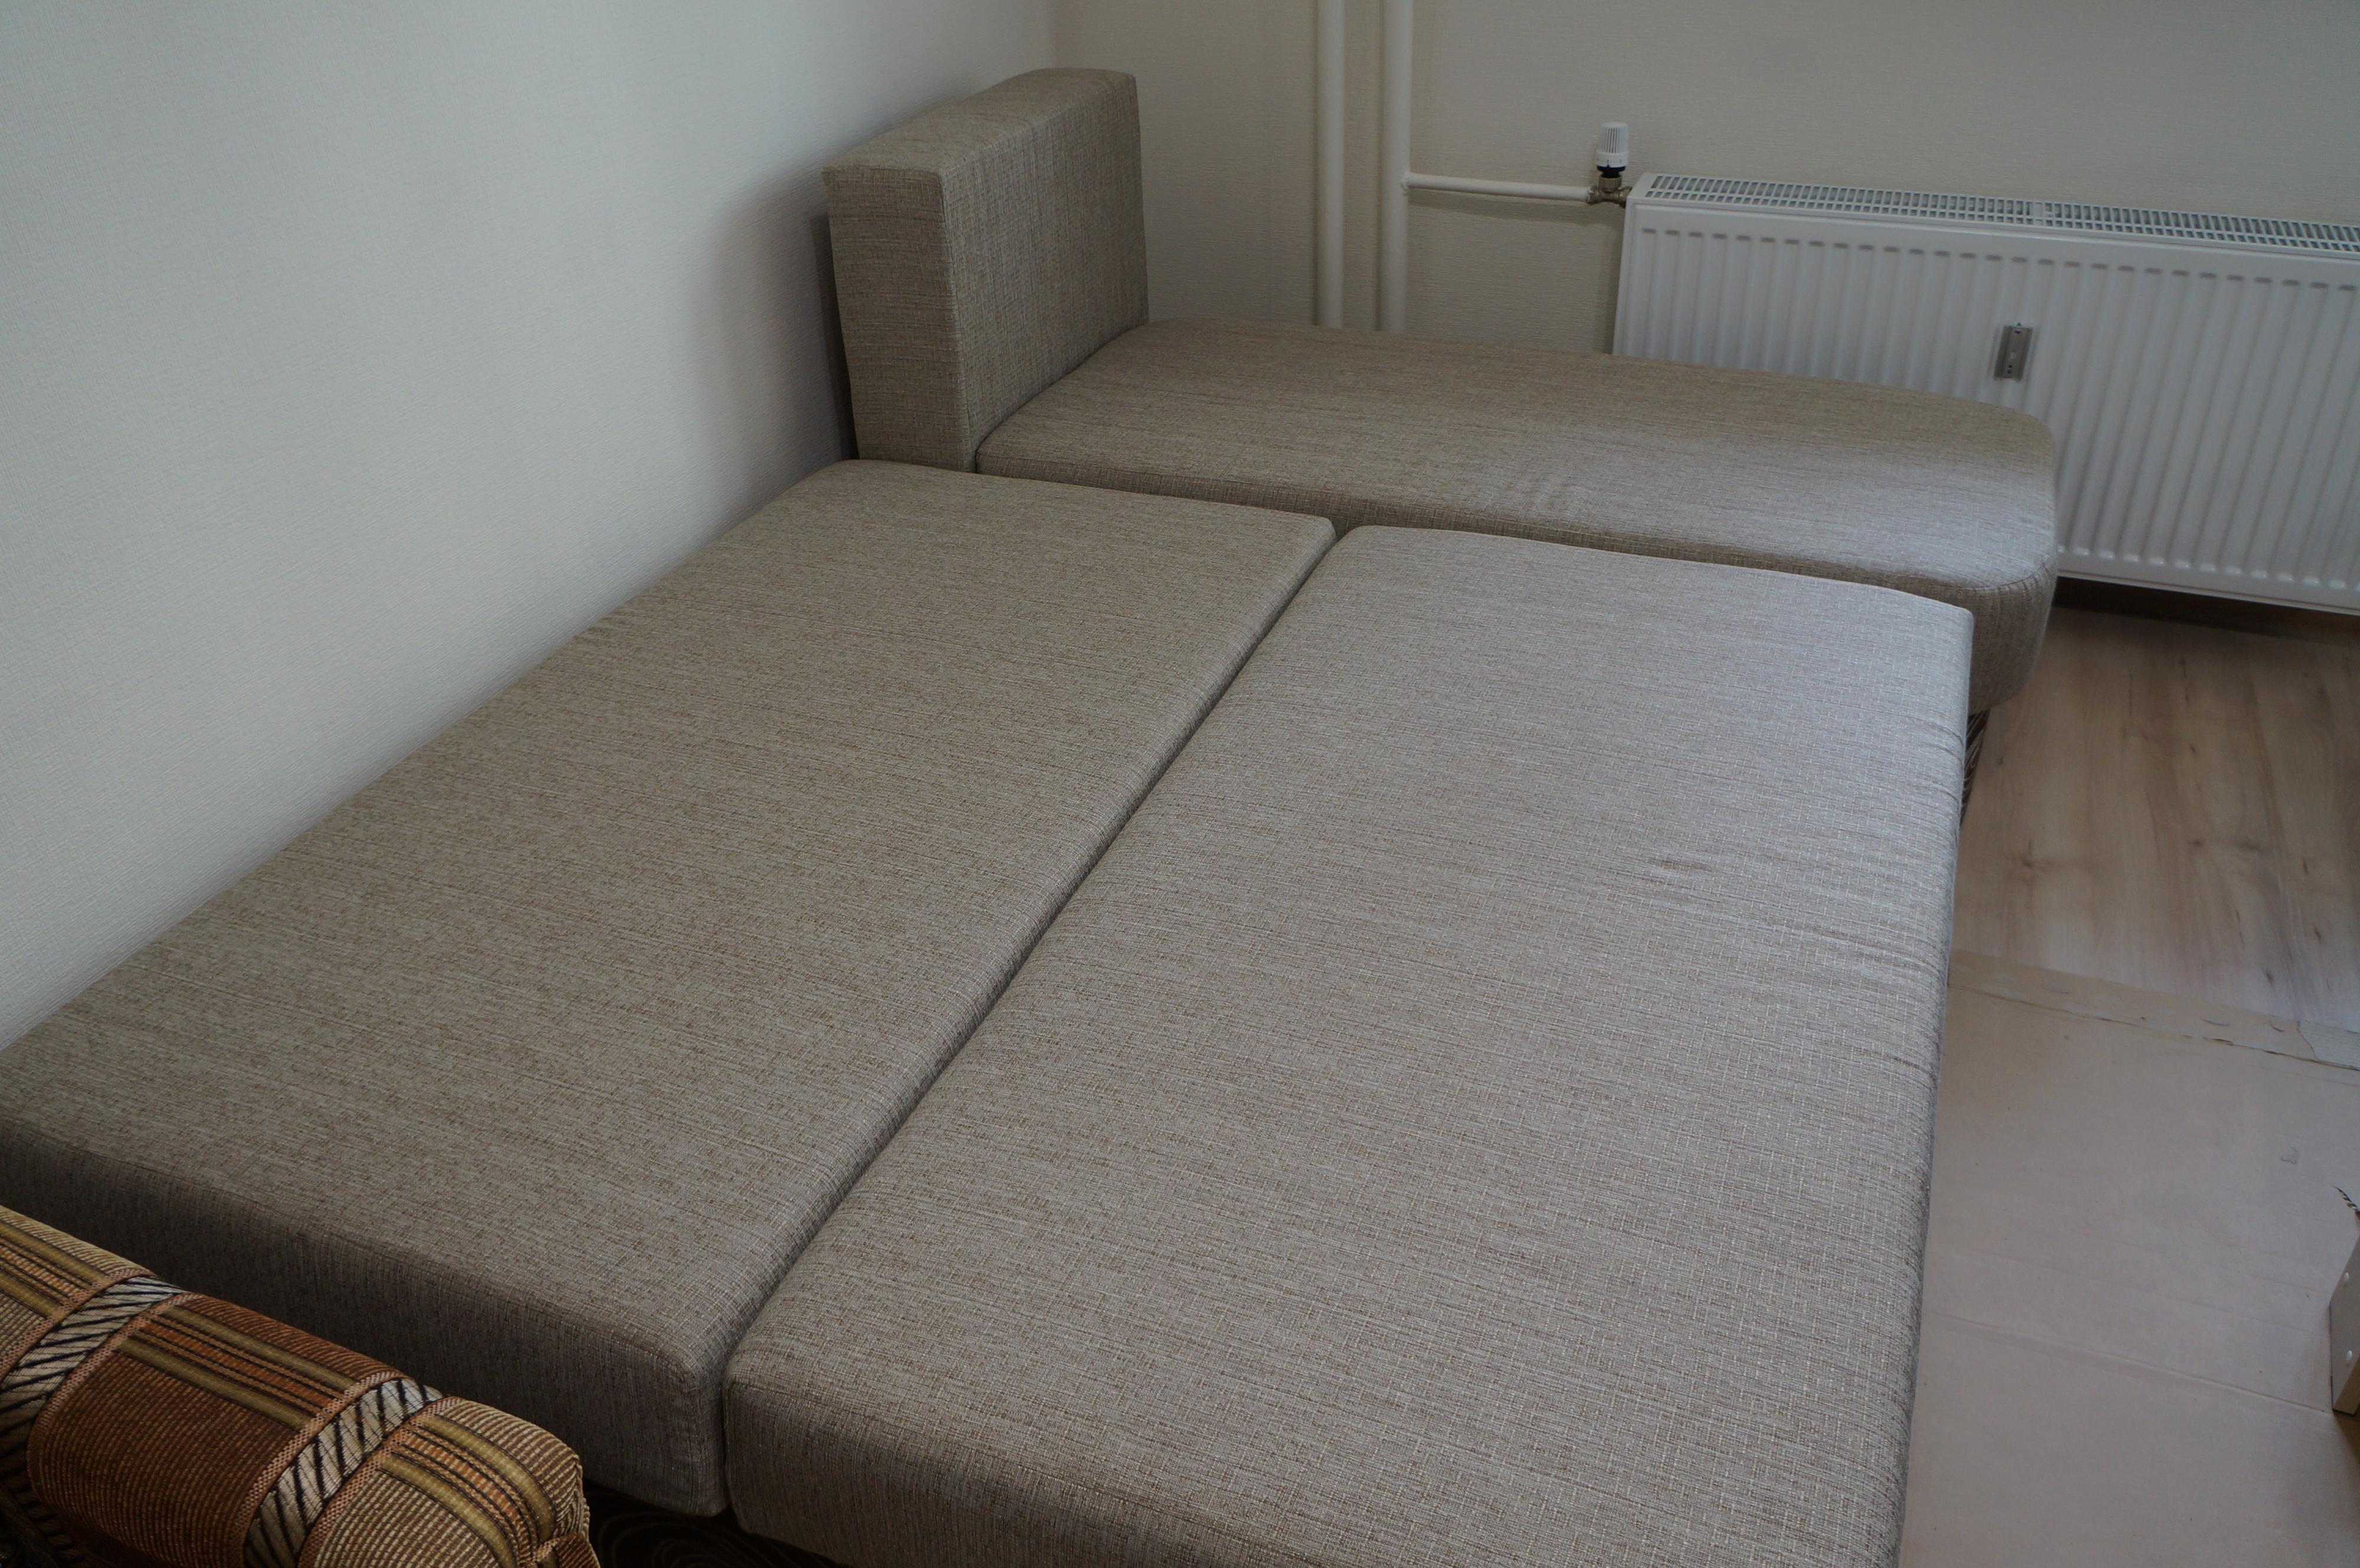 Дизайн дивана фото в  Москве